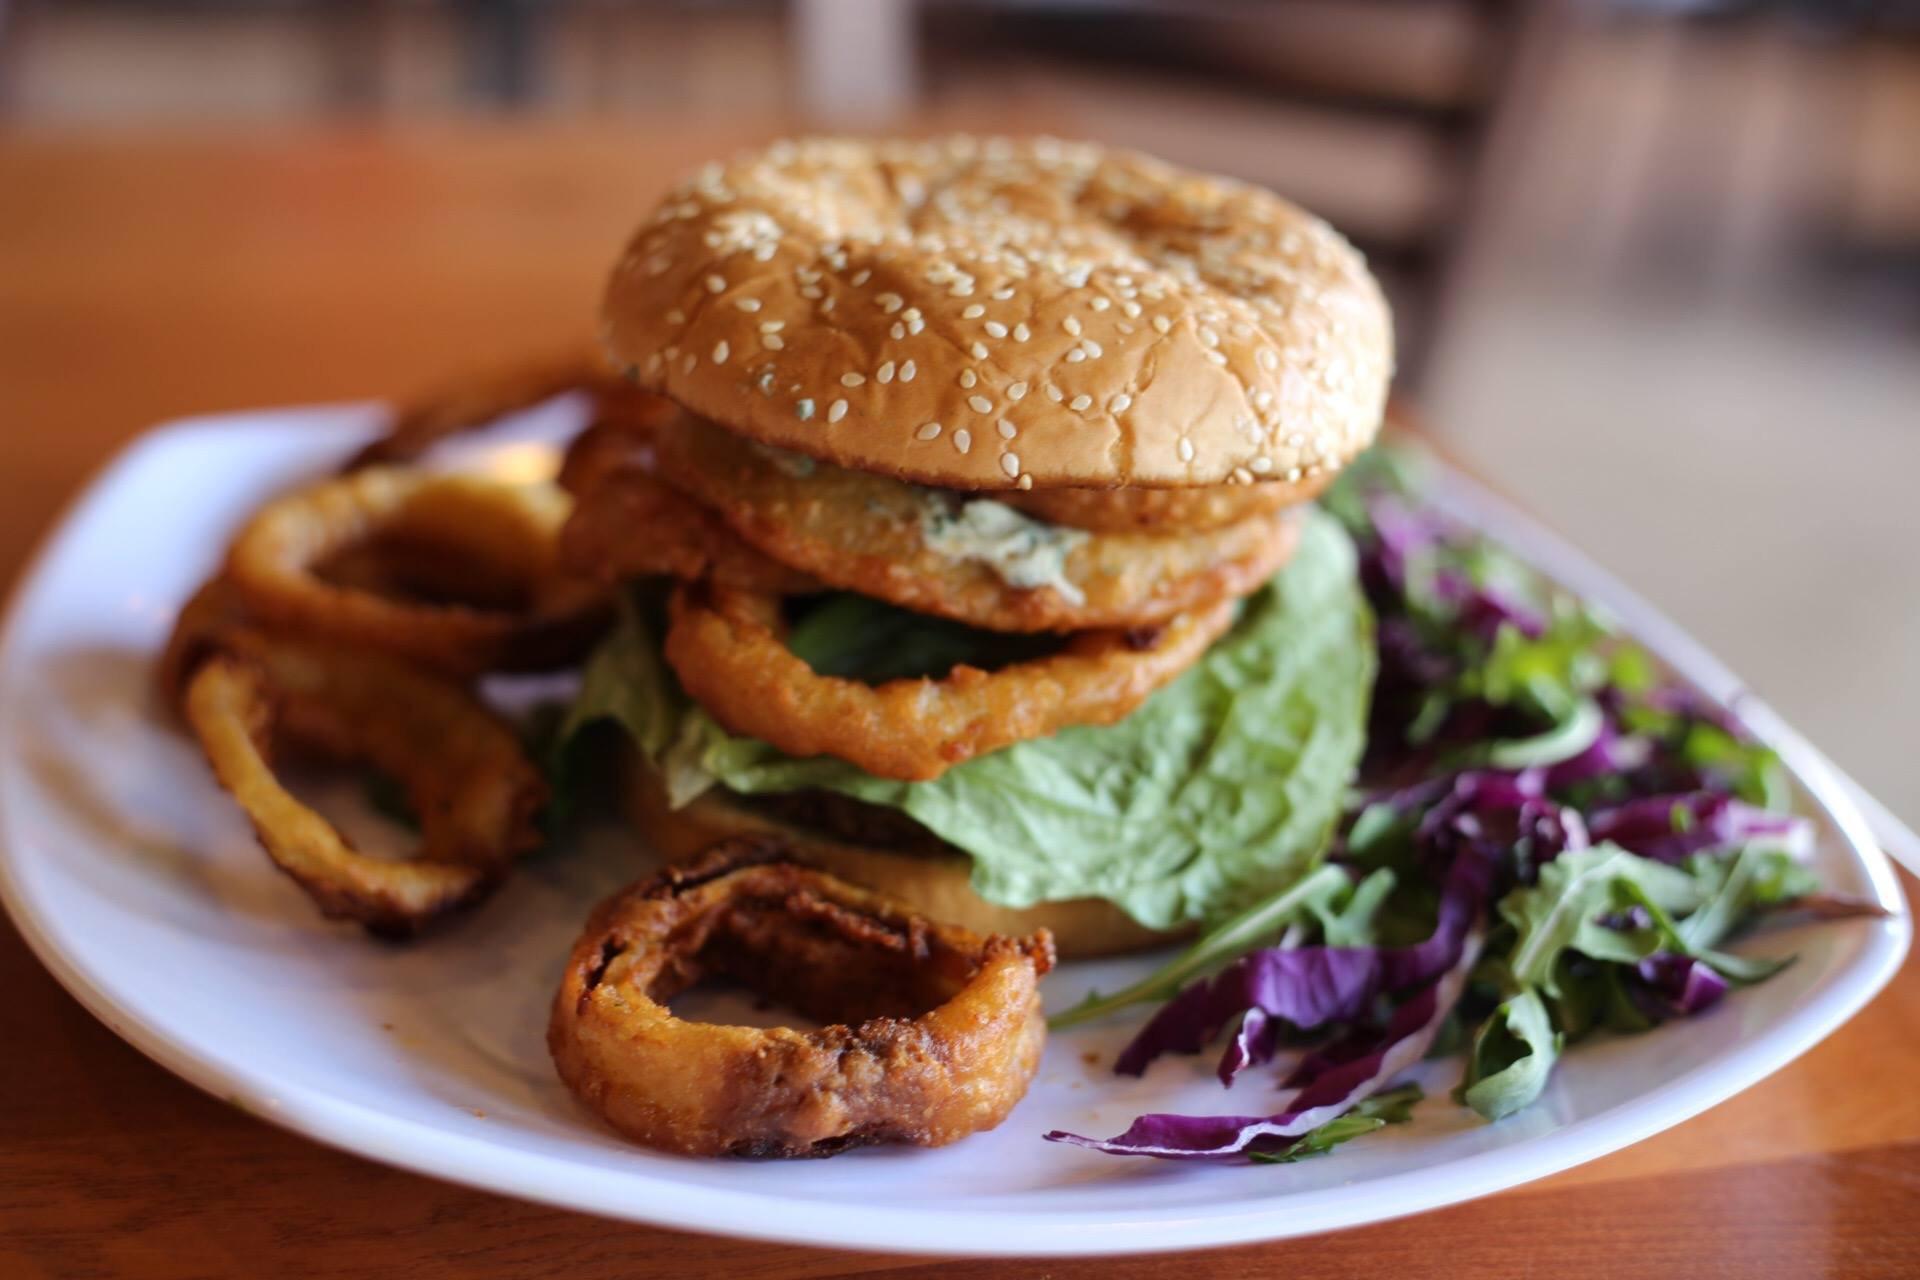 The Bleu Moon at Blinders, Burgers & Brunch